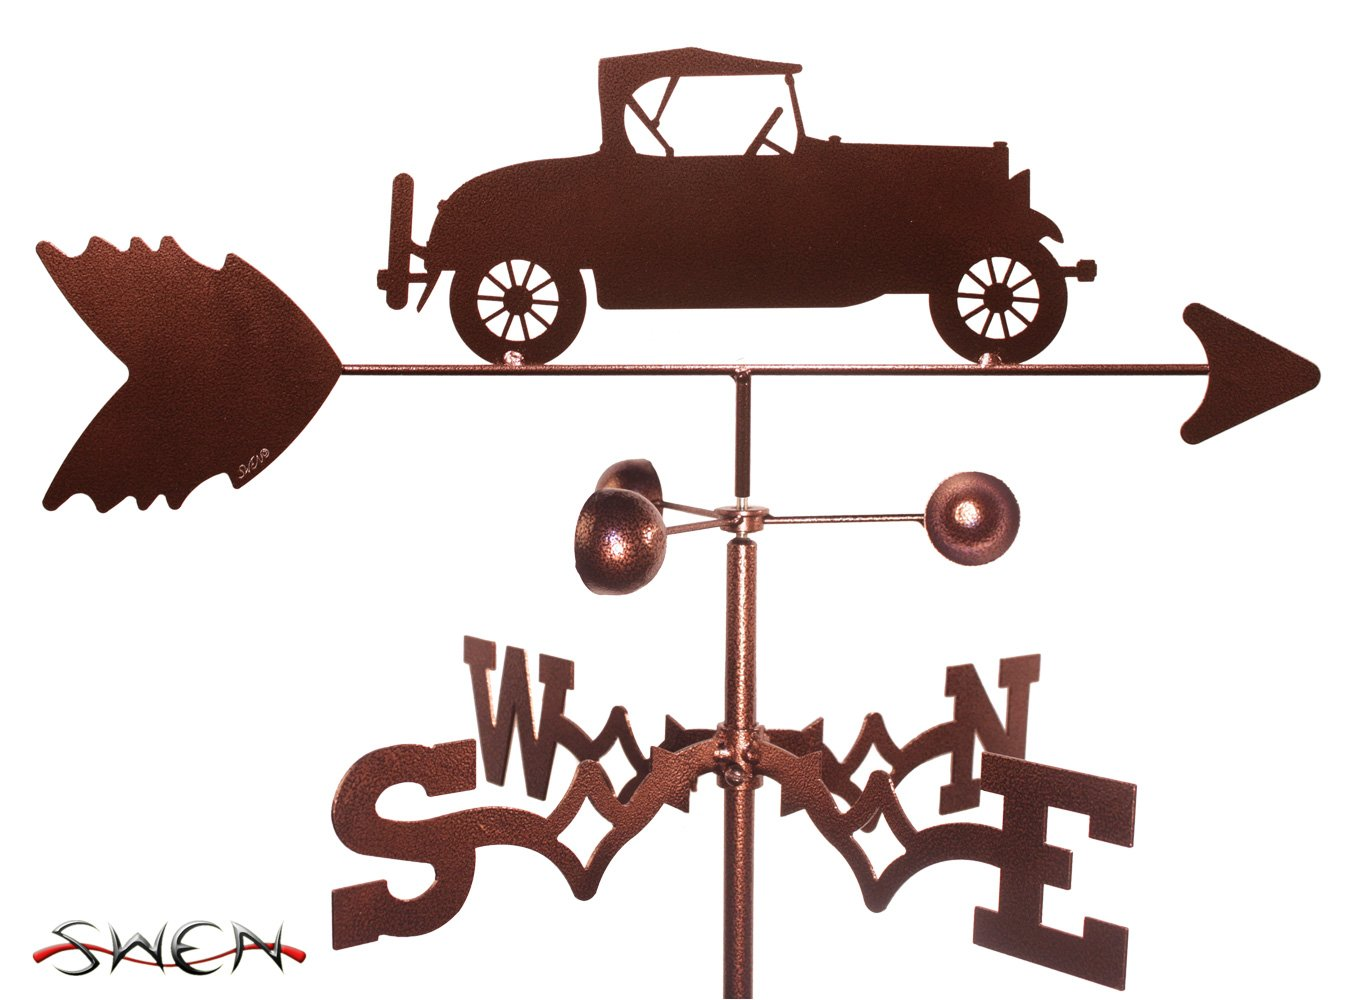 Amazon Com Swen Products Car Model A Weathervane Windcup Weathervanes Garden Outdoor